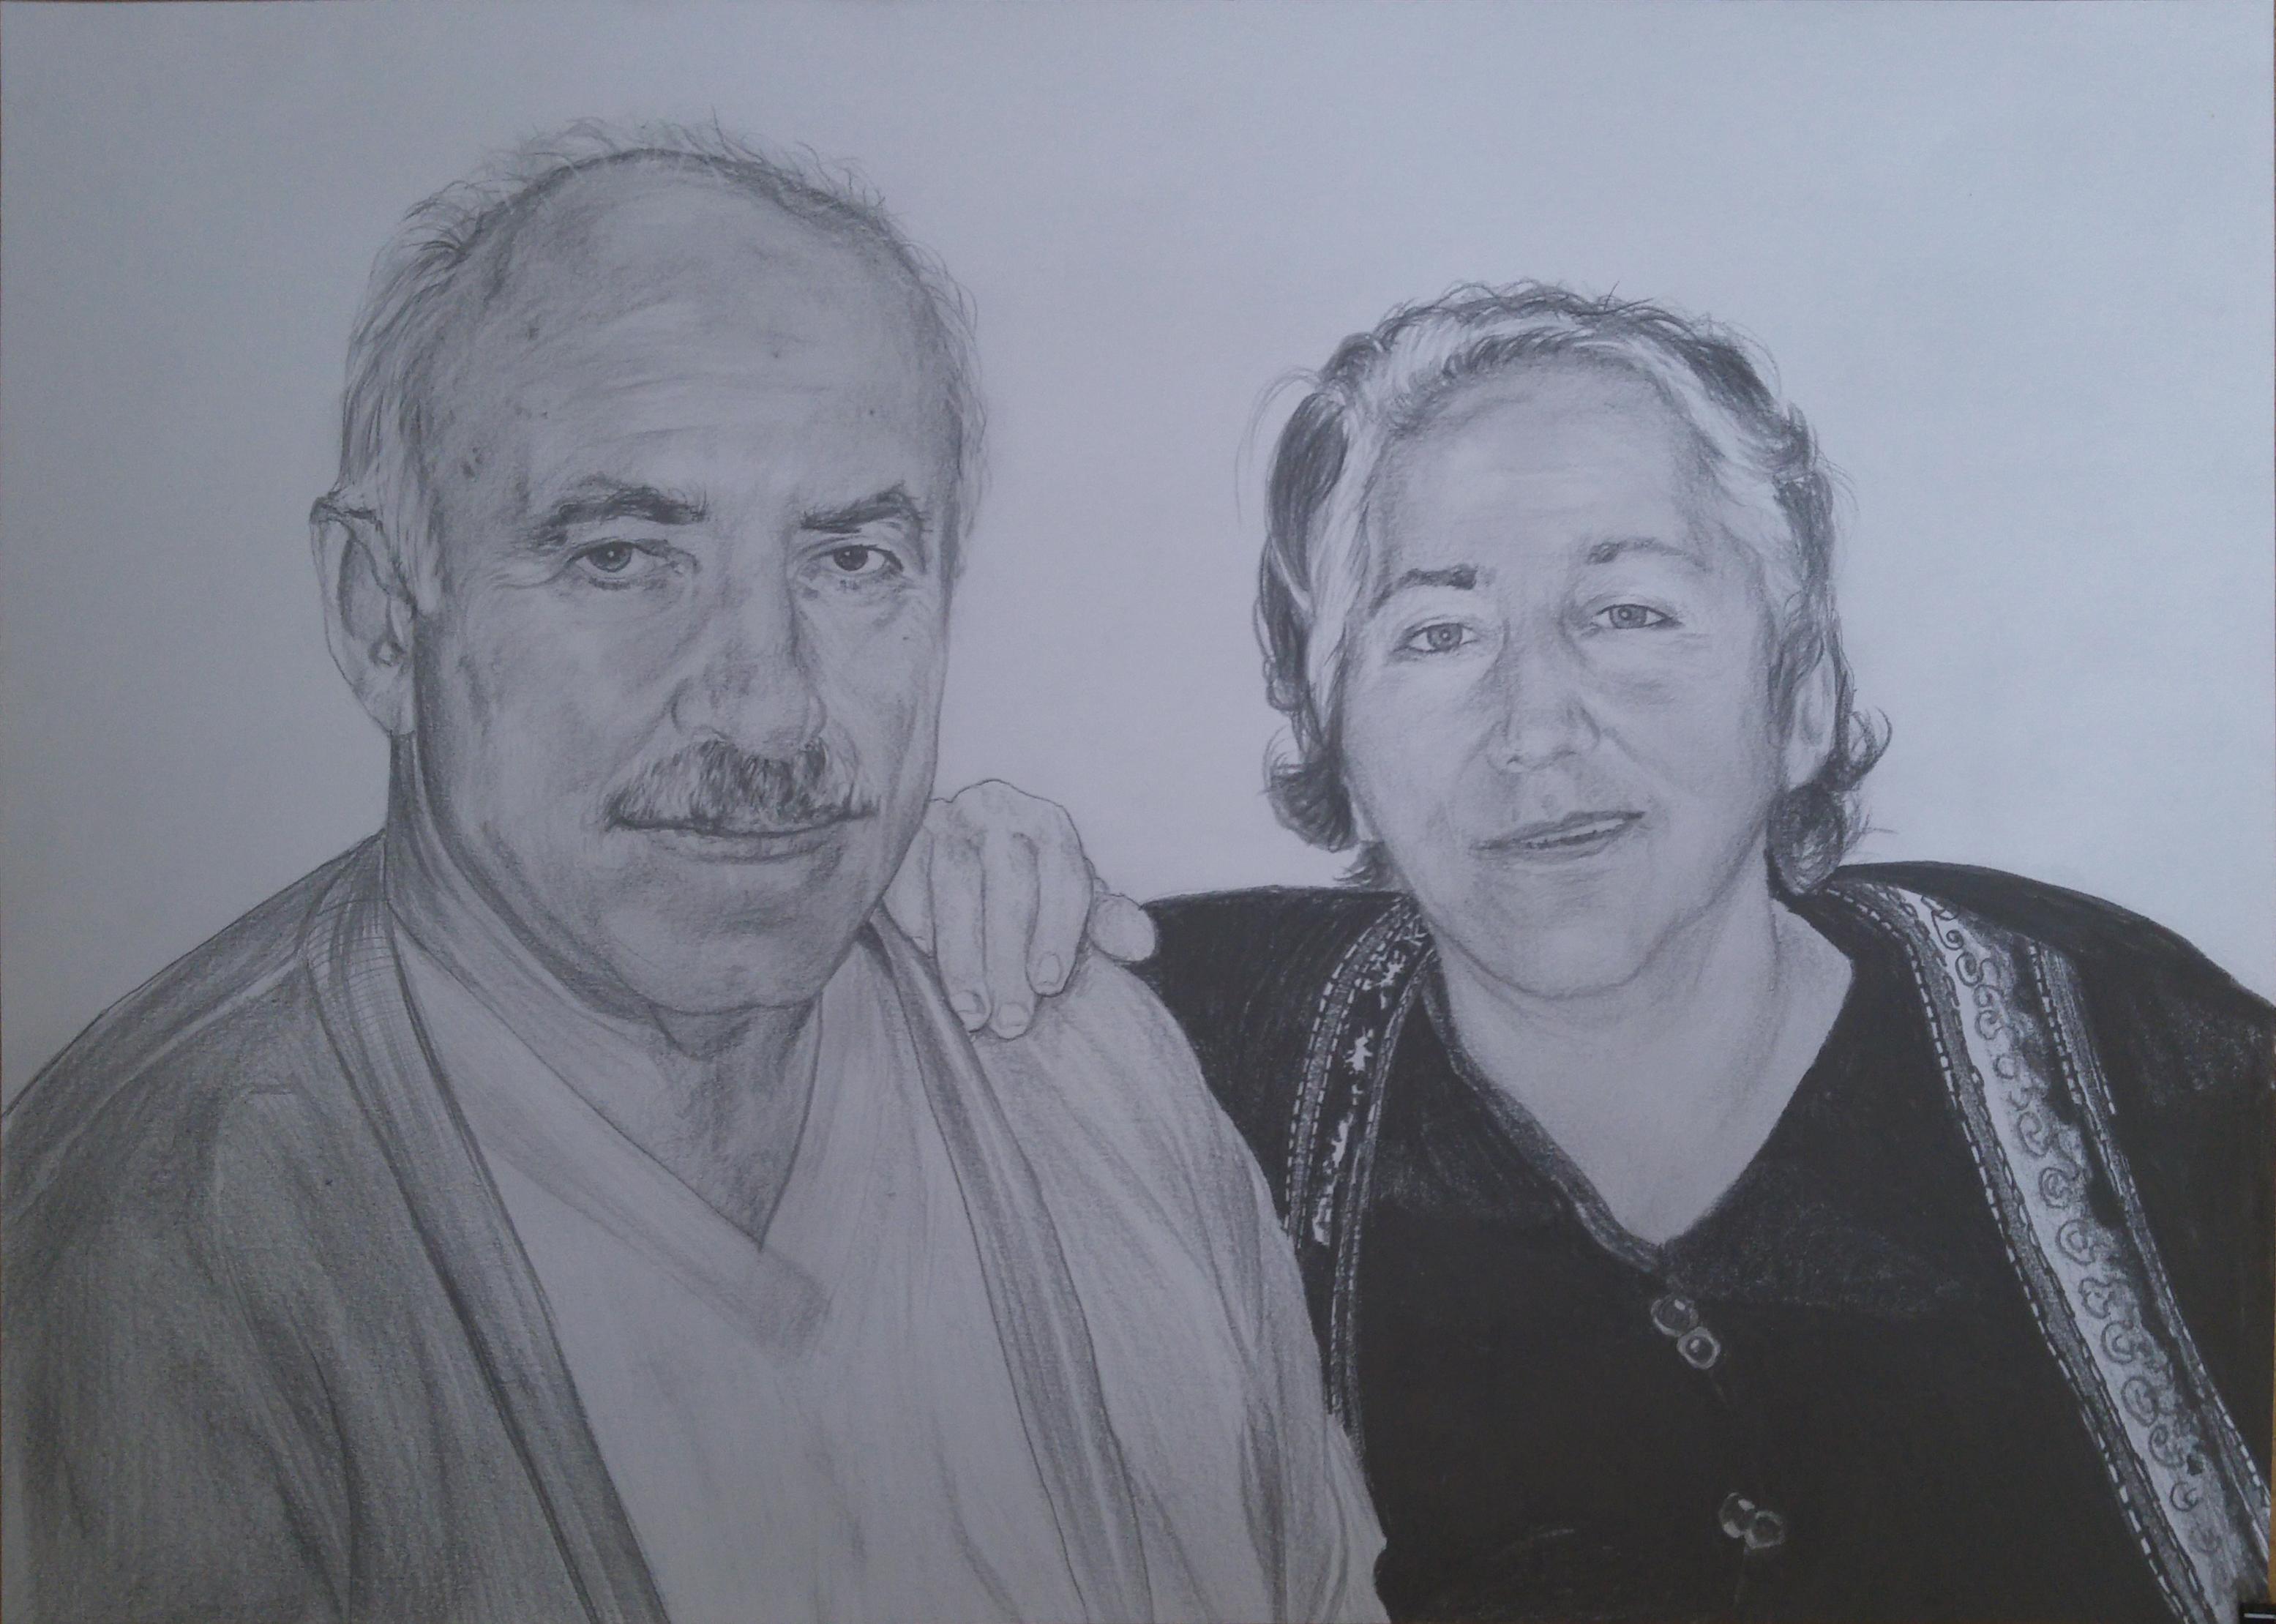 anne baba karakalem portre çizimi